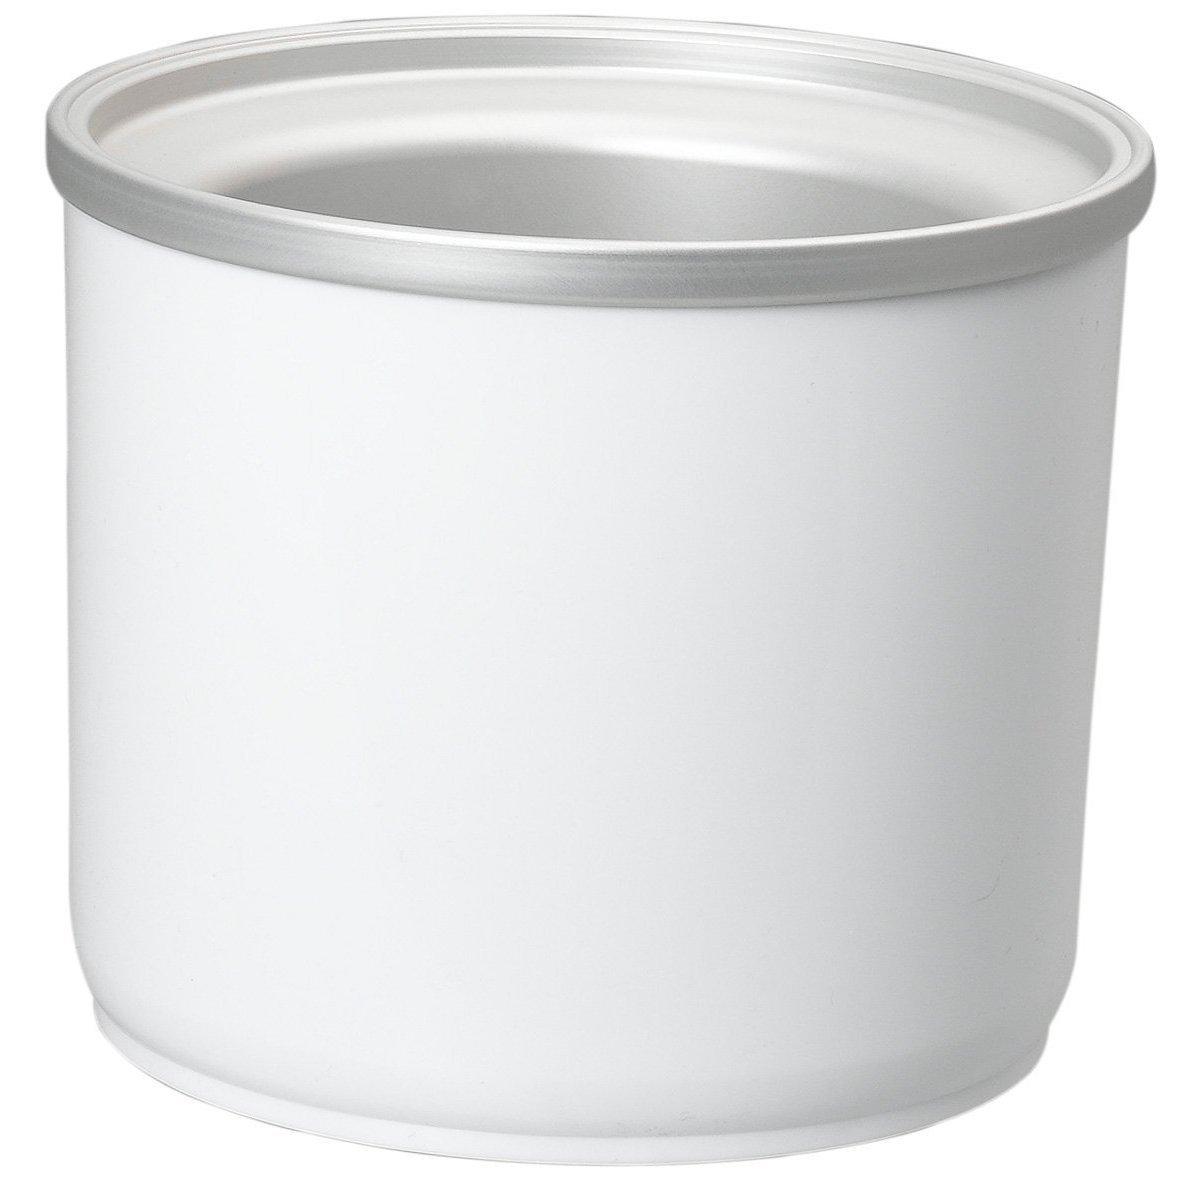 Cuisinart ICE-45RFB Ice Cream Maker Freezer Bowl